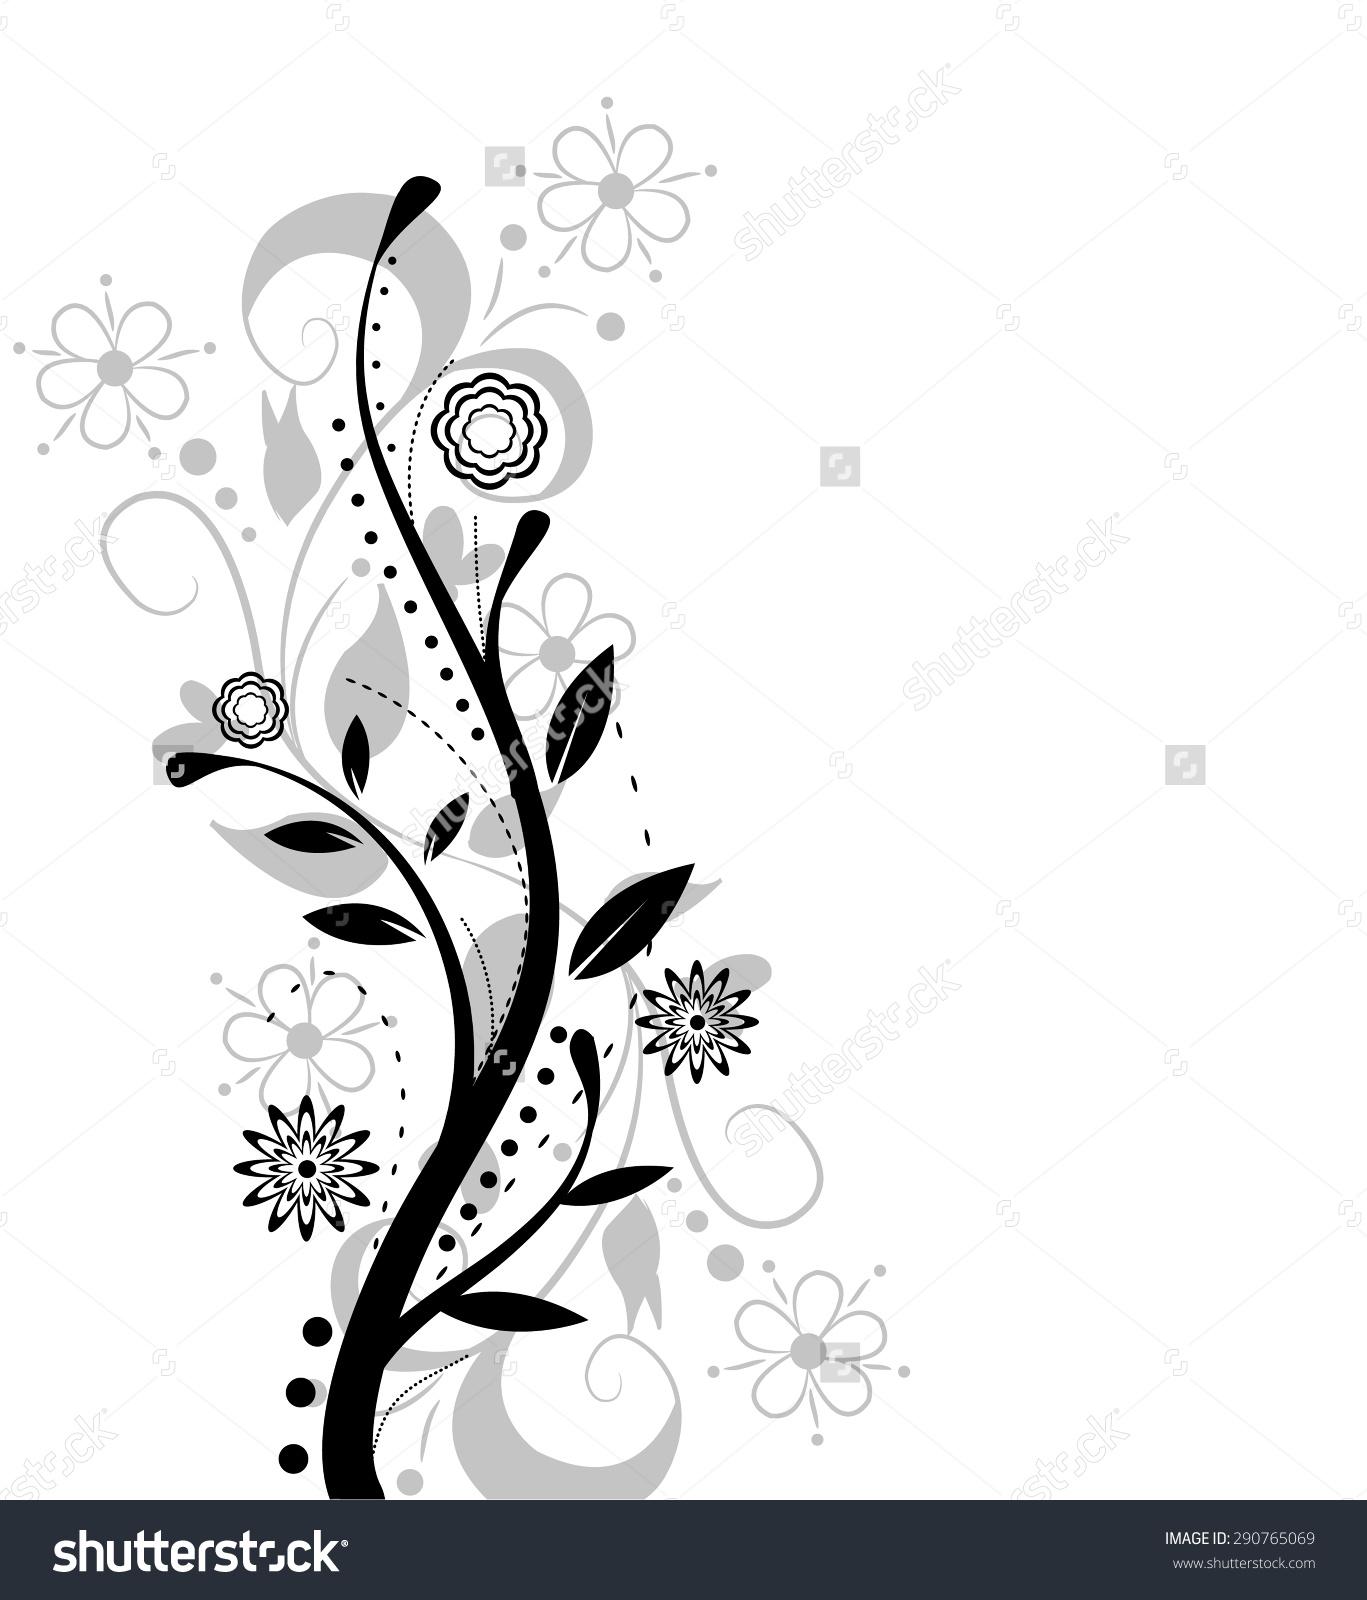 Black And White Flower Nails Diy Easy Daisy Nail Art Design ~ Clipgoo.